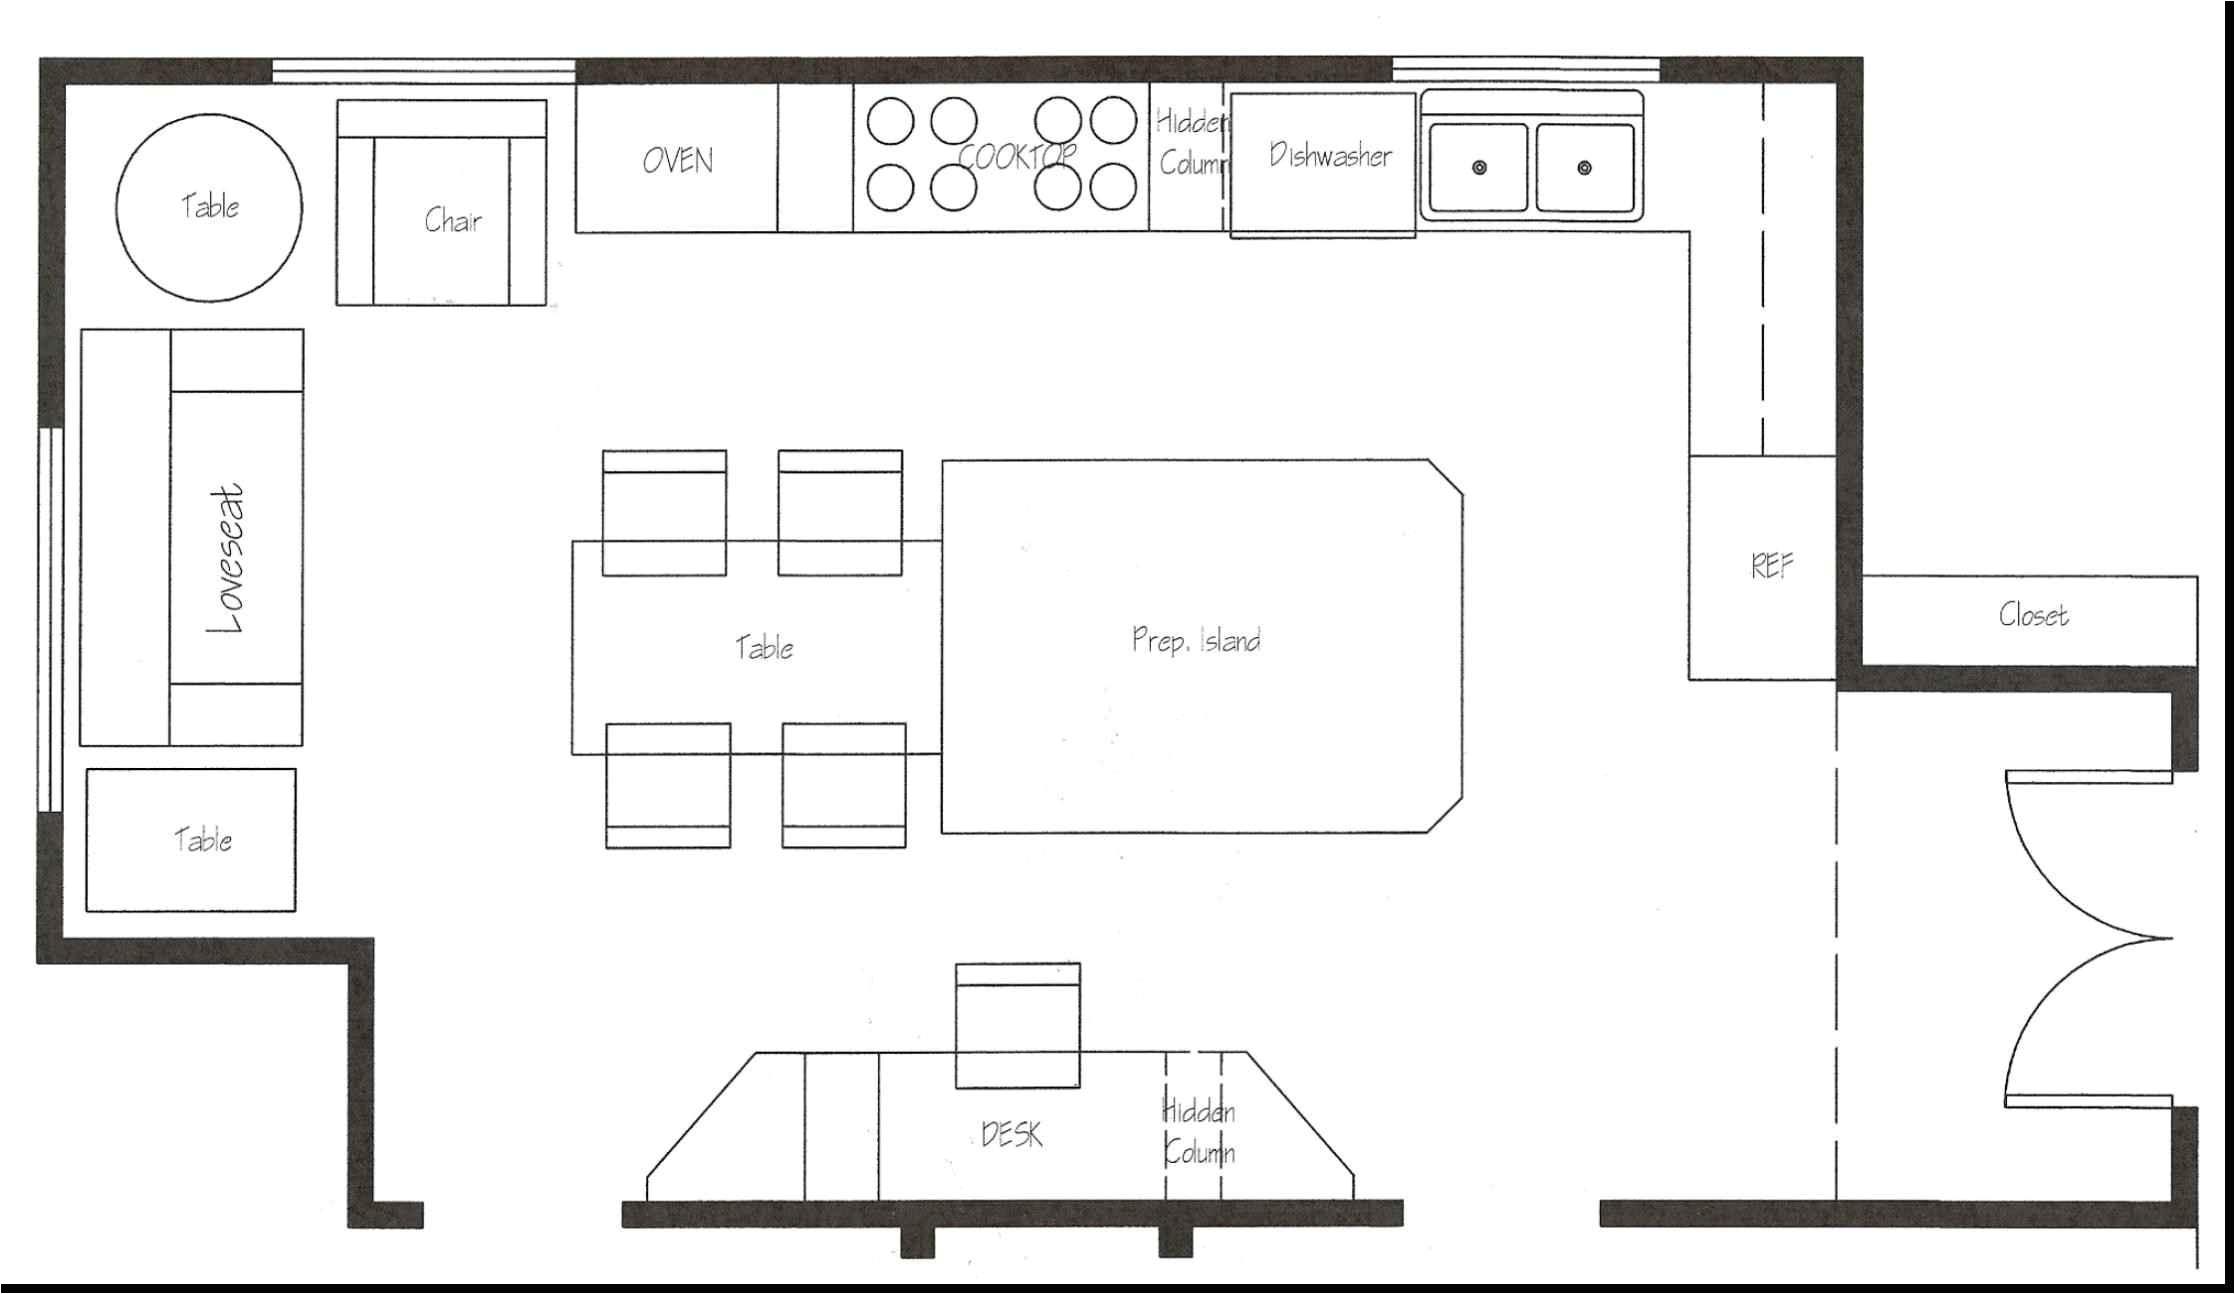 floor plan light switch or electrical floor plan 2004 2010 bmw x3 e83 3 0d m57